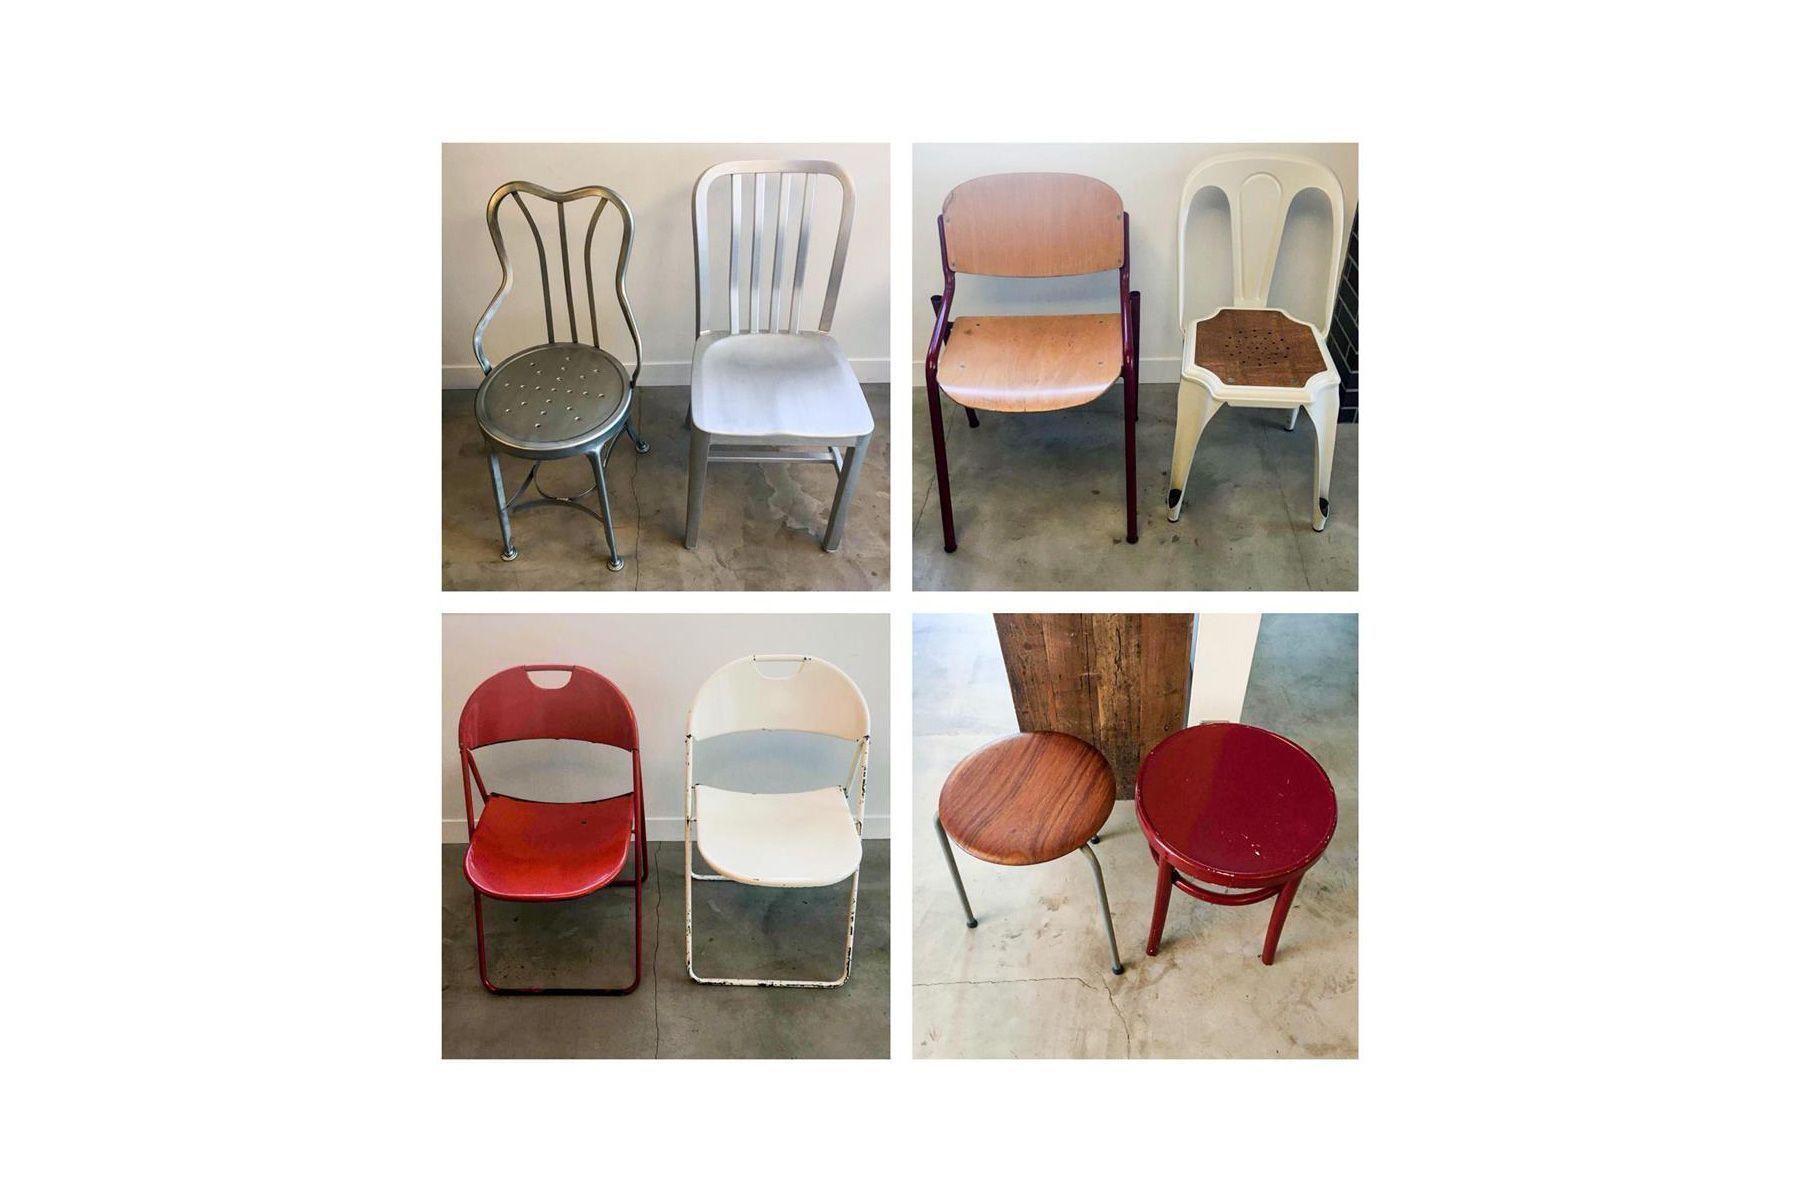 purulico(プルリコ)西麻布椅子